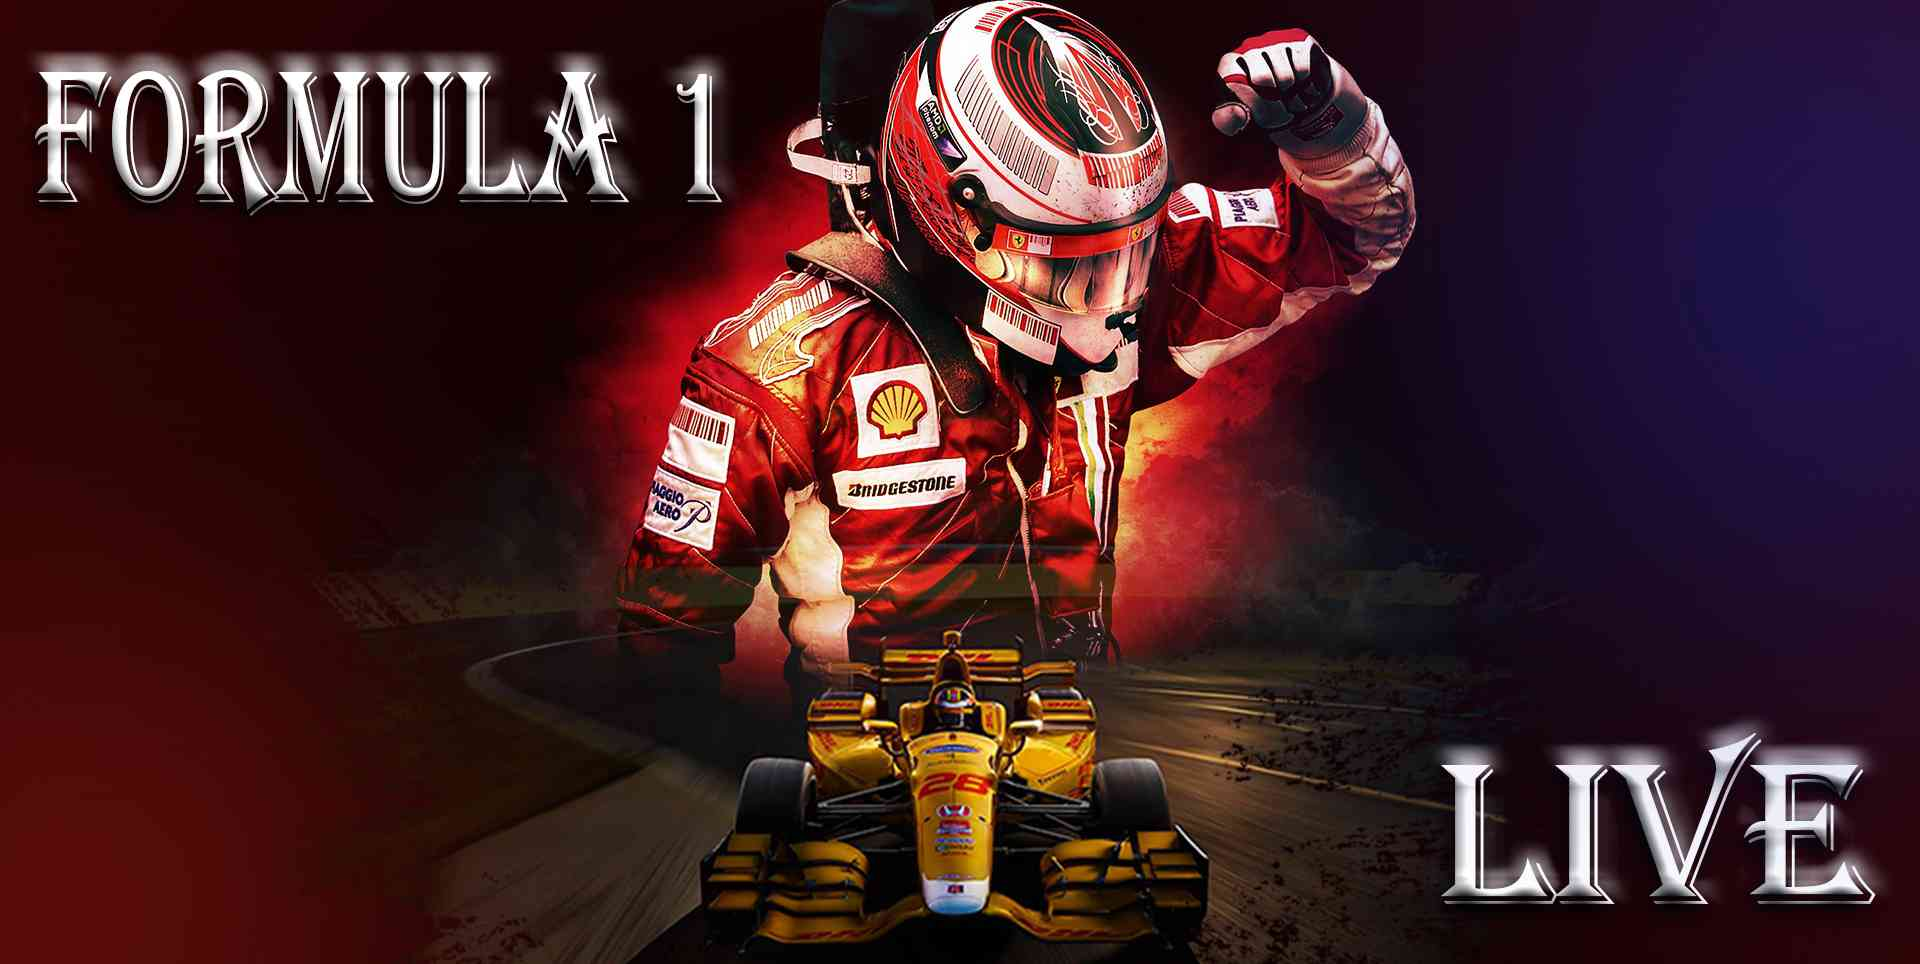 live-round-2-italian-formula-4-adria-race-2016-online